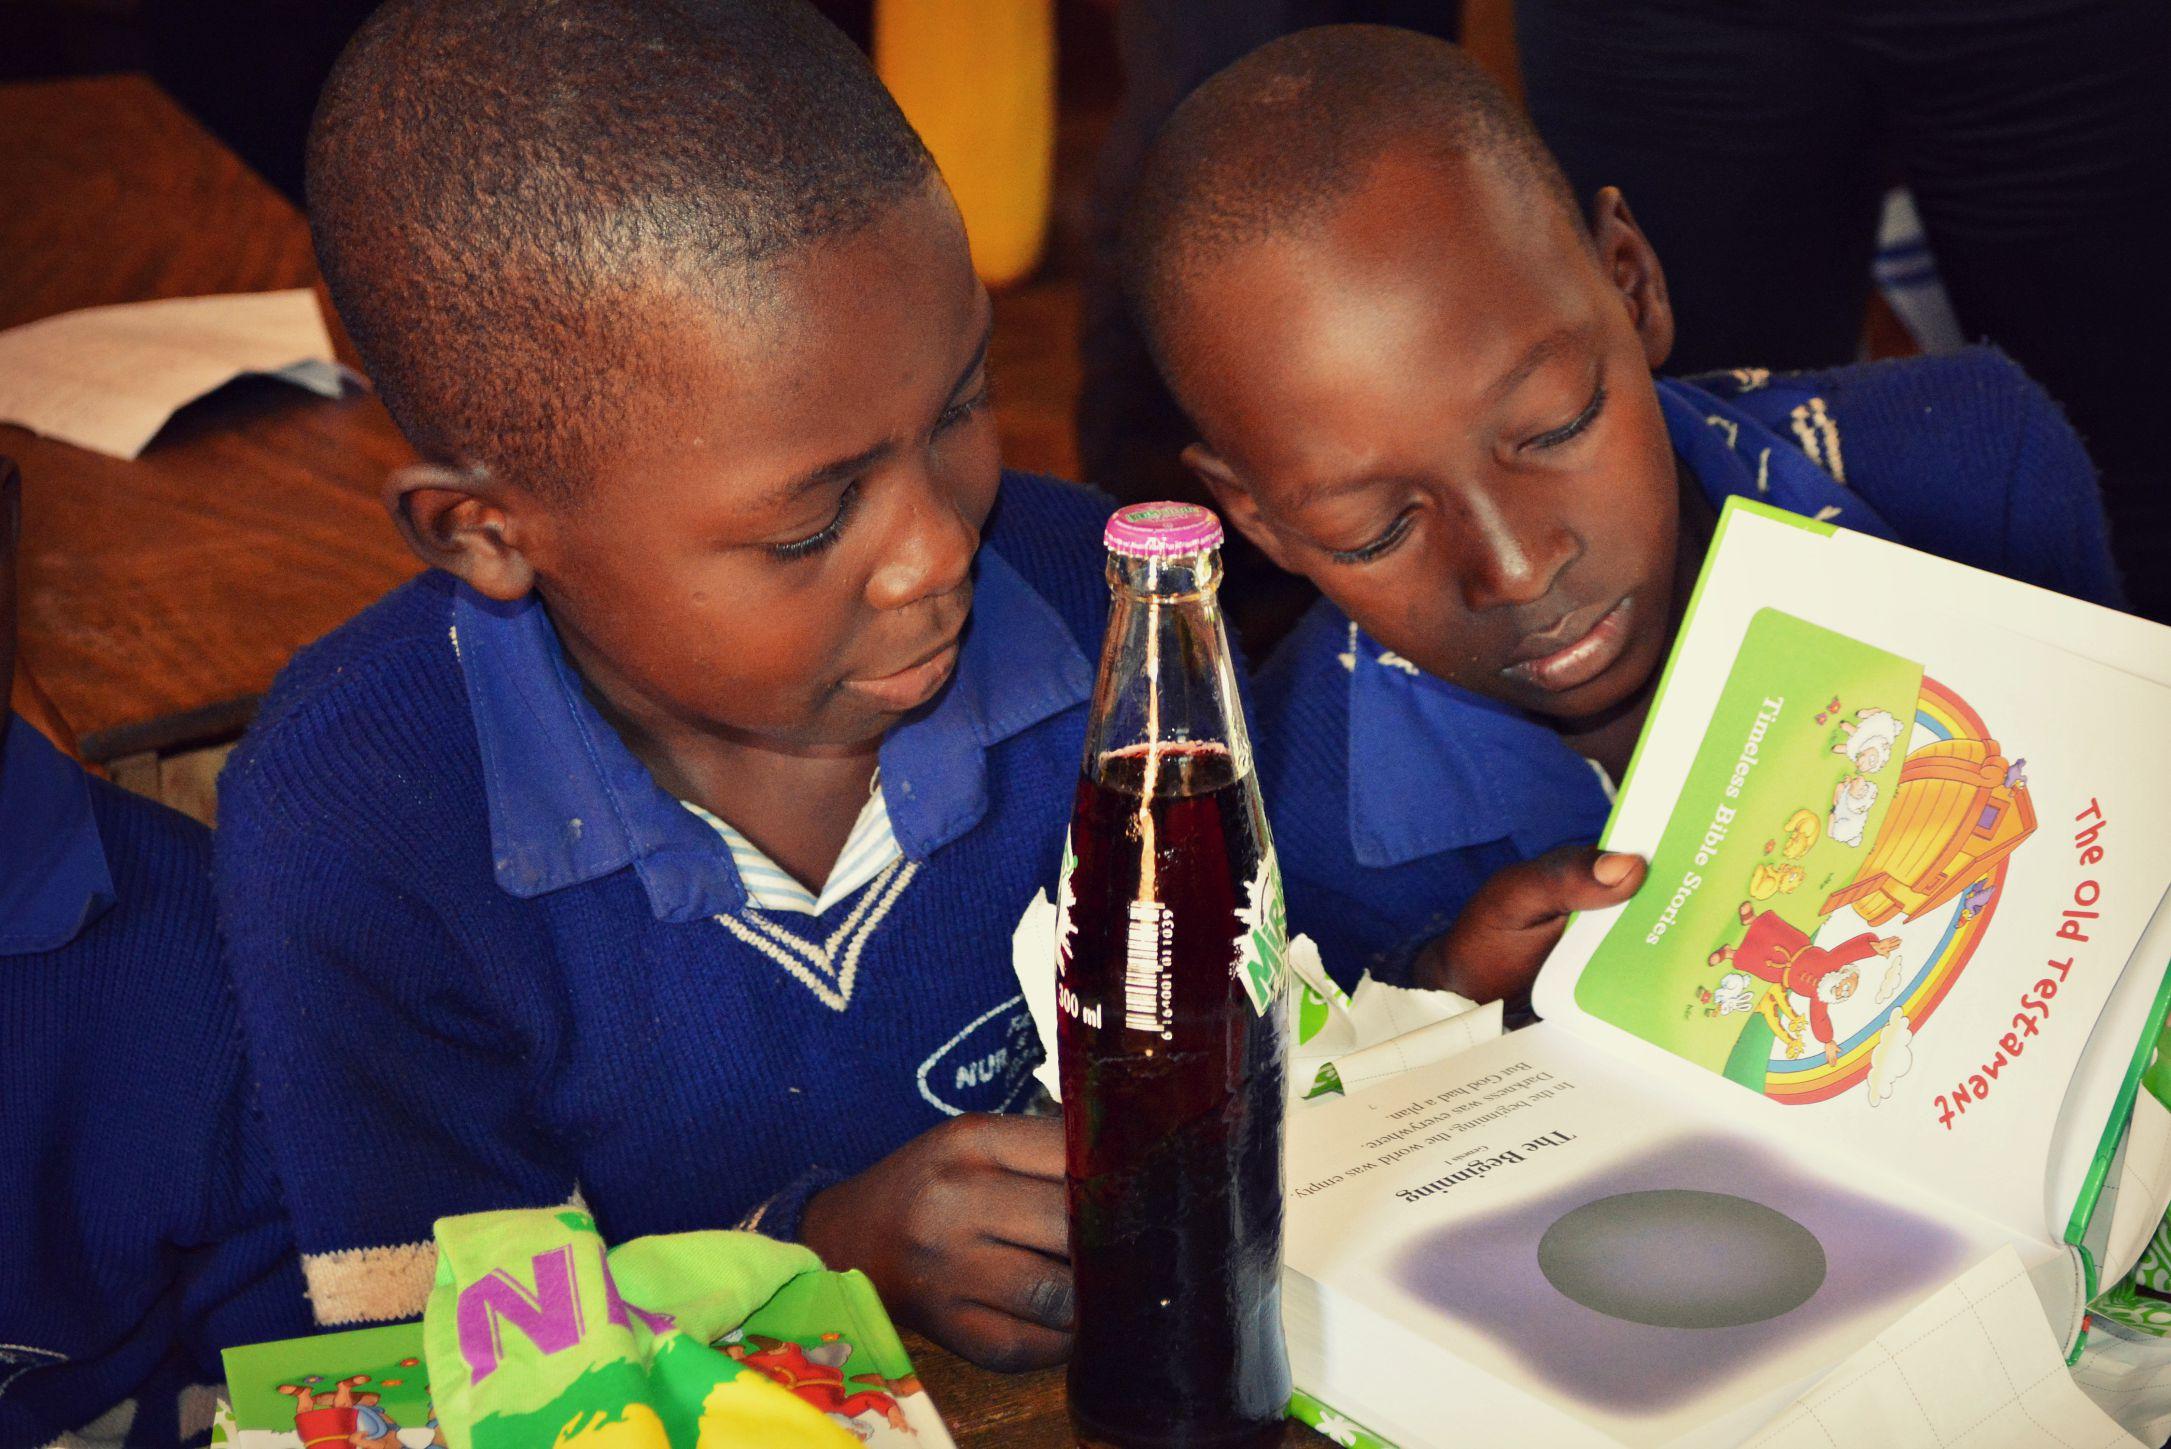 vine kids with bible and coke.jpg